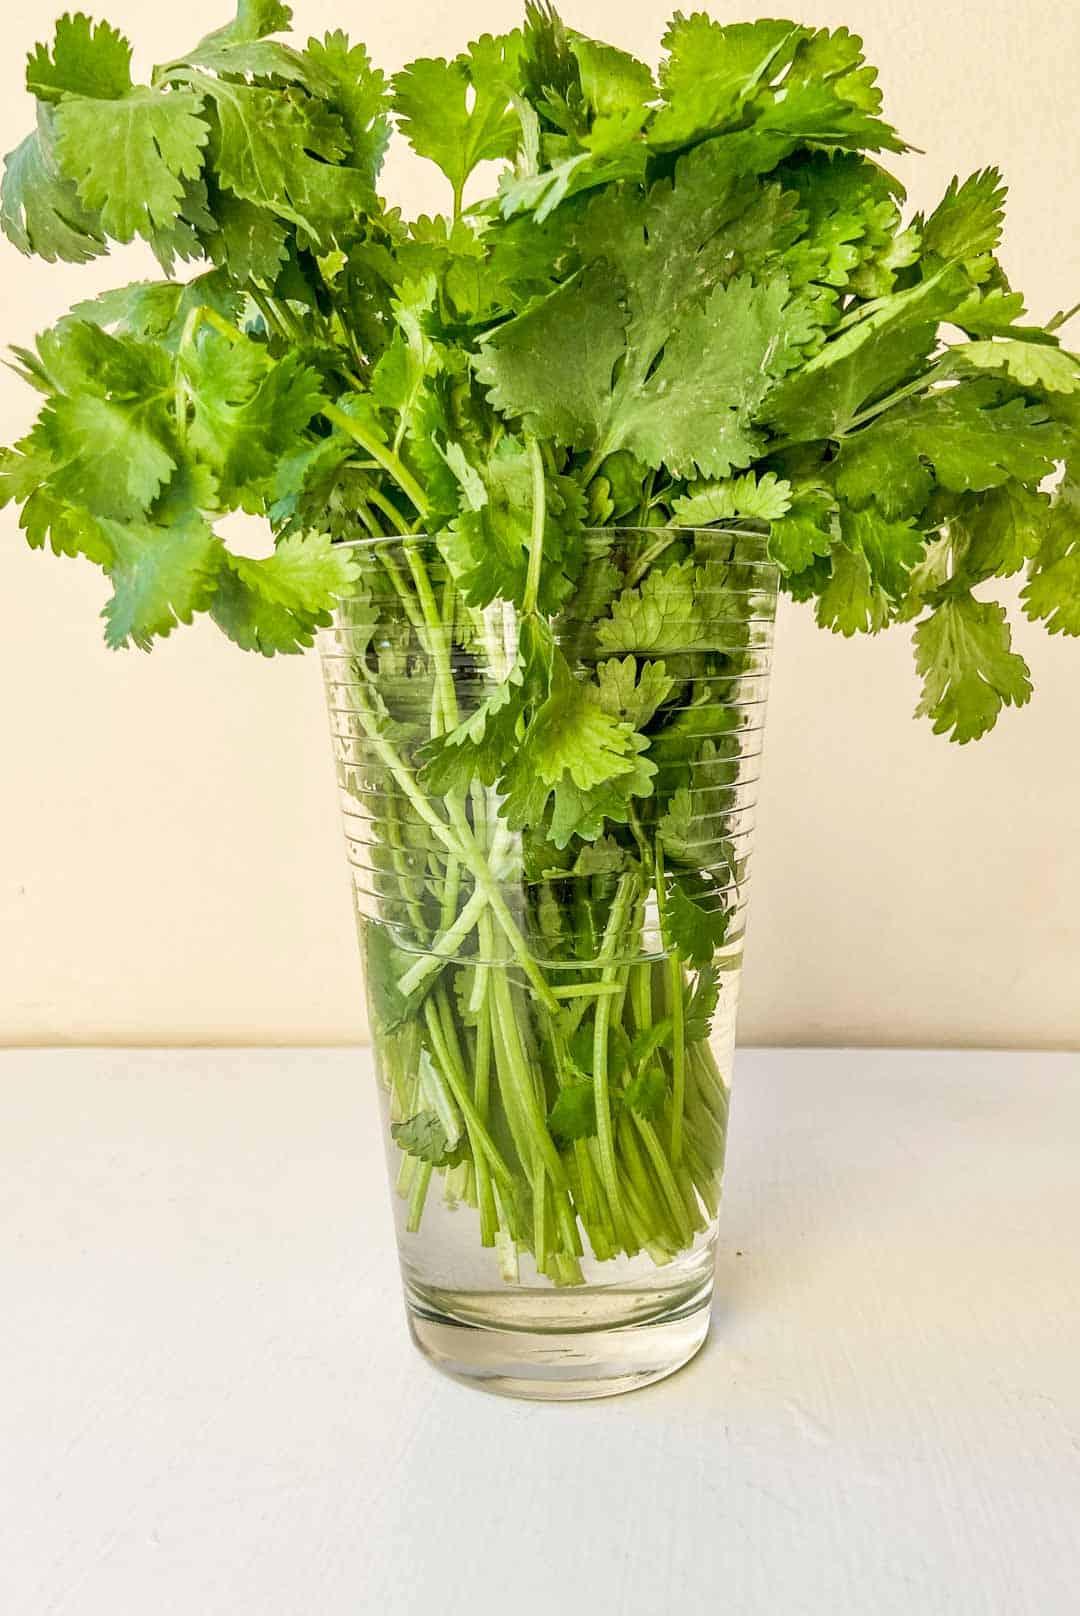 cilantro in a water glass